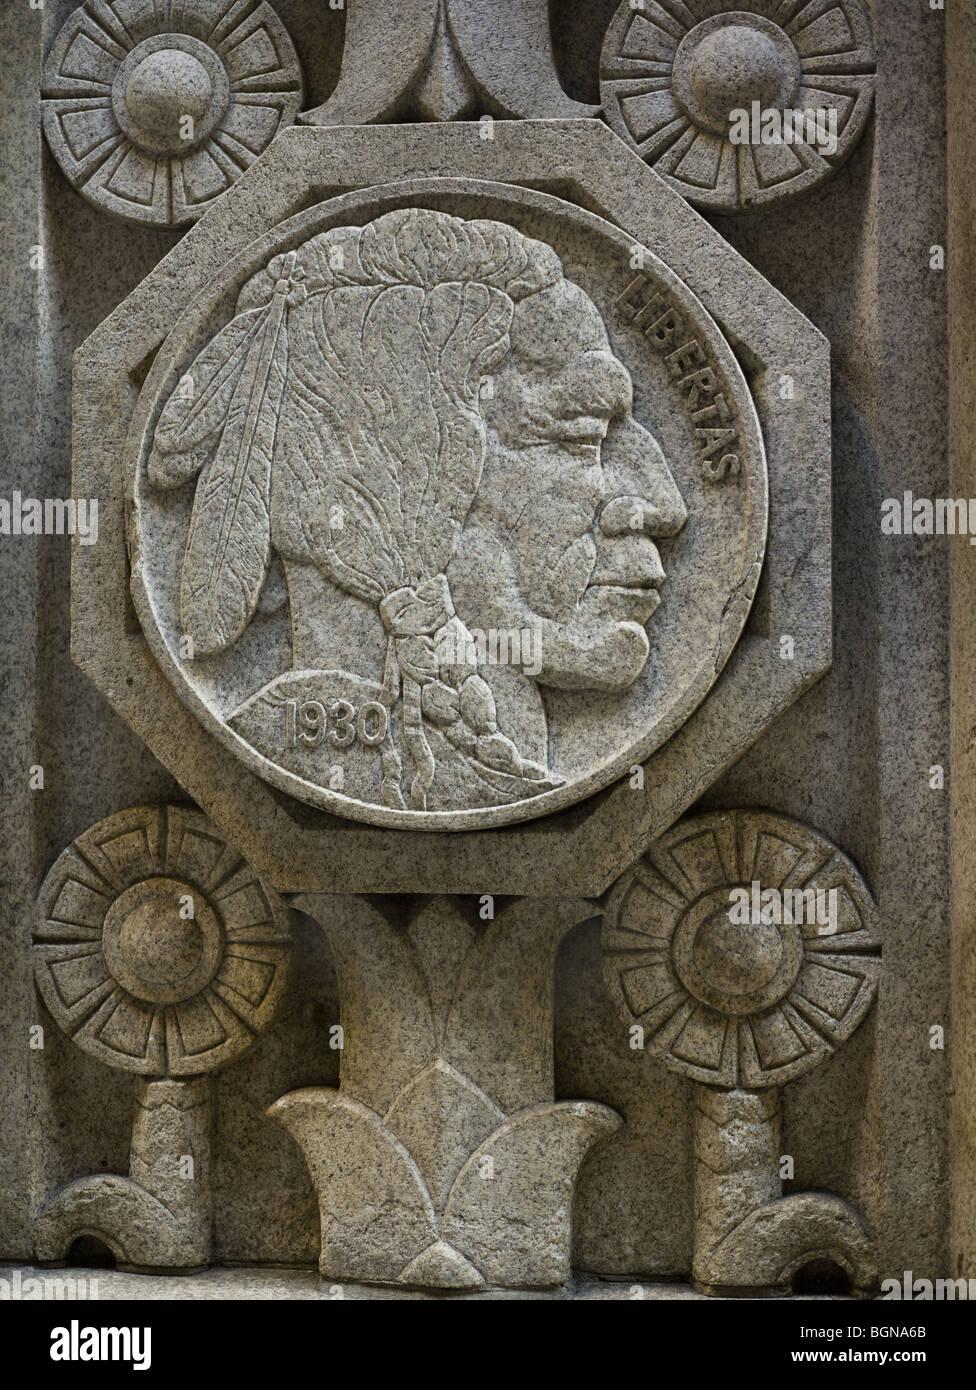 20 Exchange Place New York, Art Deco plaque: native American